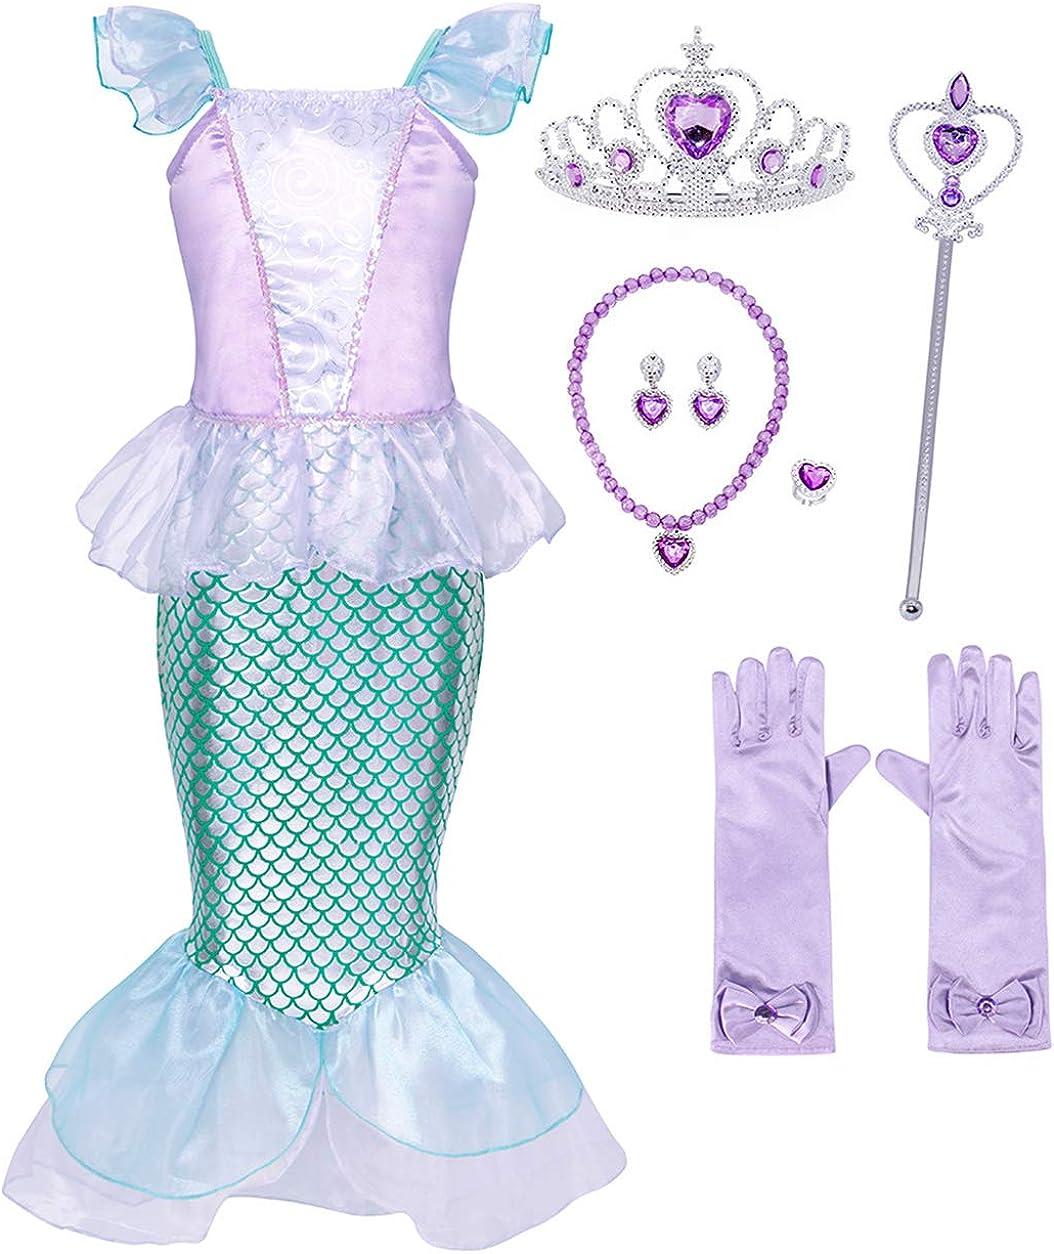 HenzWorld Little Girl Dress Costume Mermaid Princess Birthday Halloween Cosplay Accessories